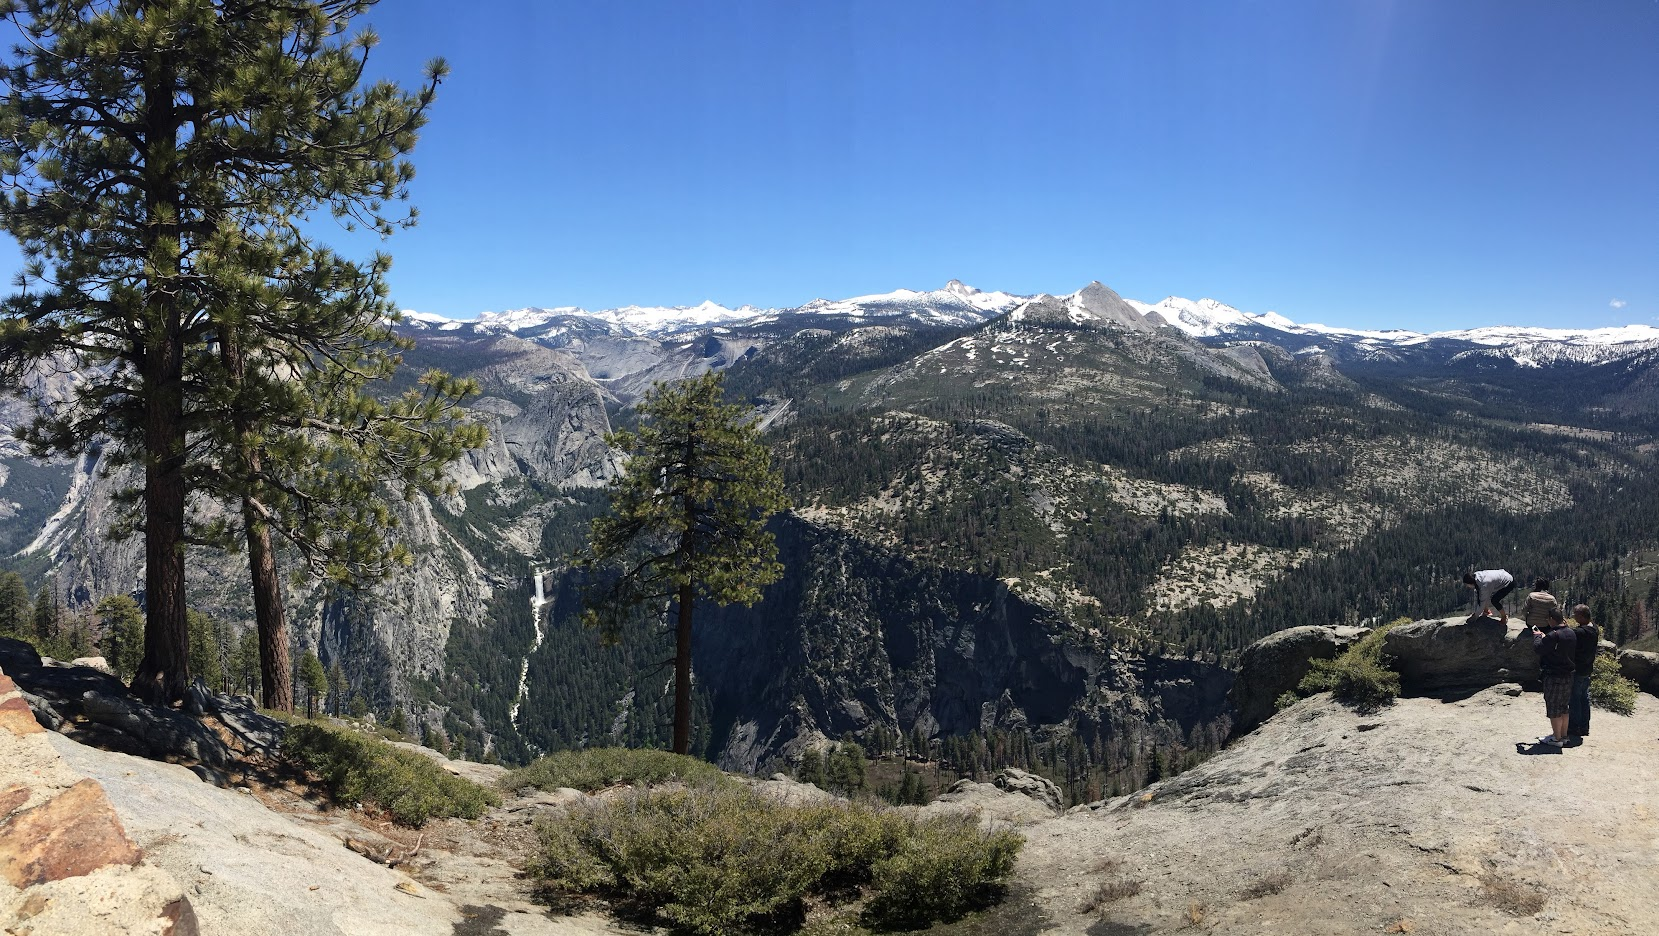 Yosemite National Park View